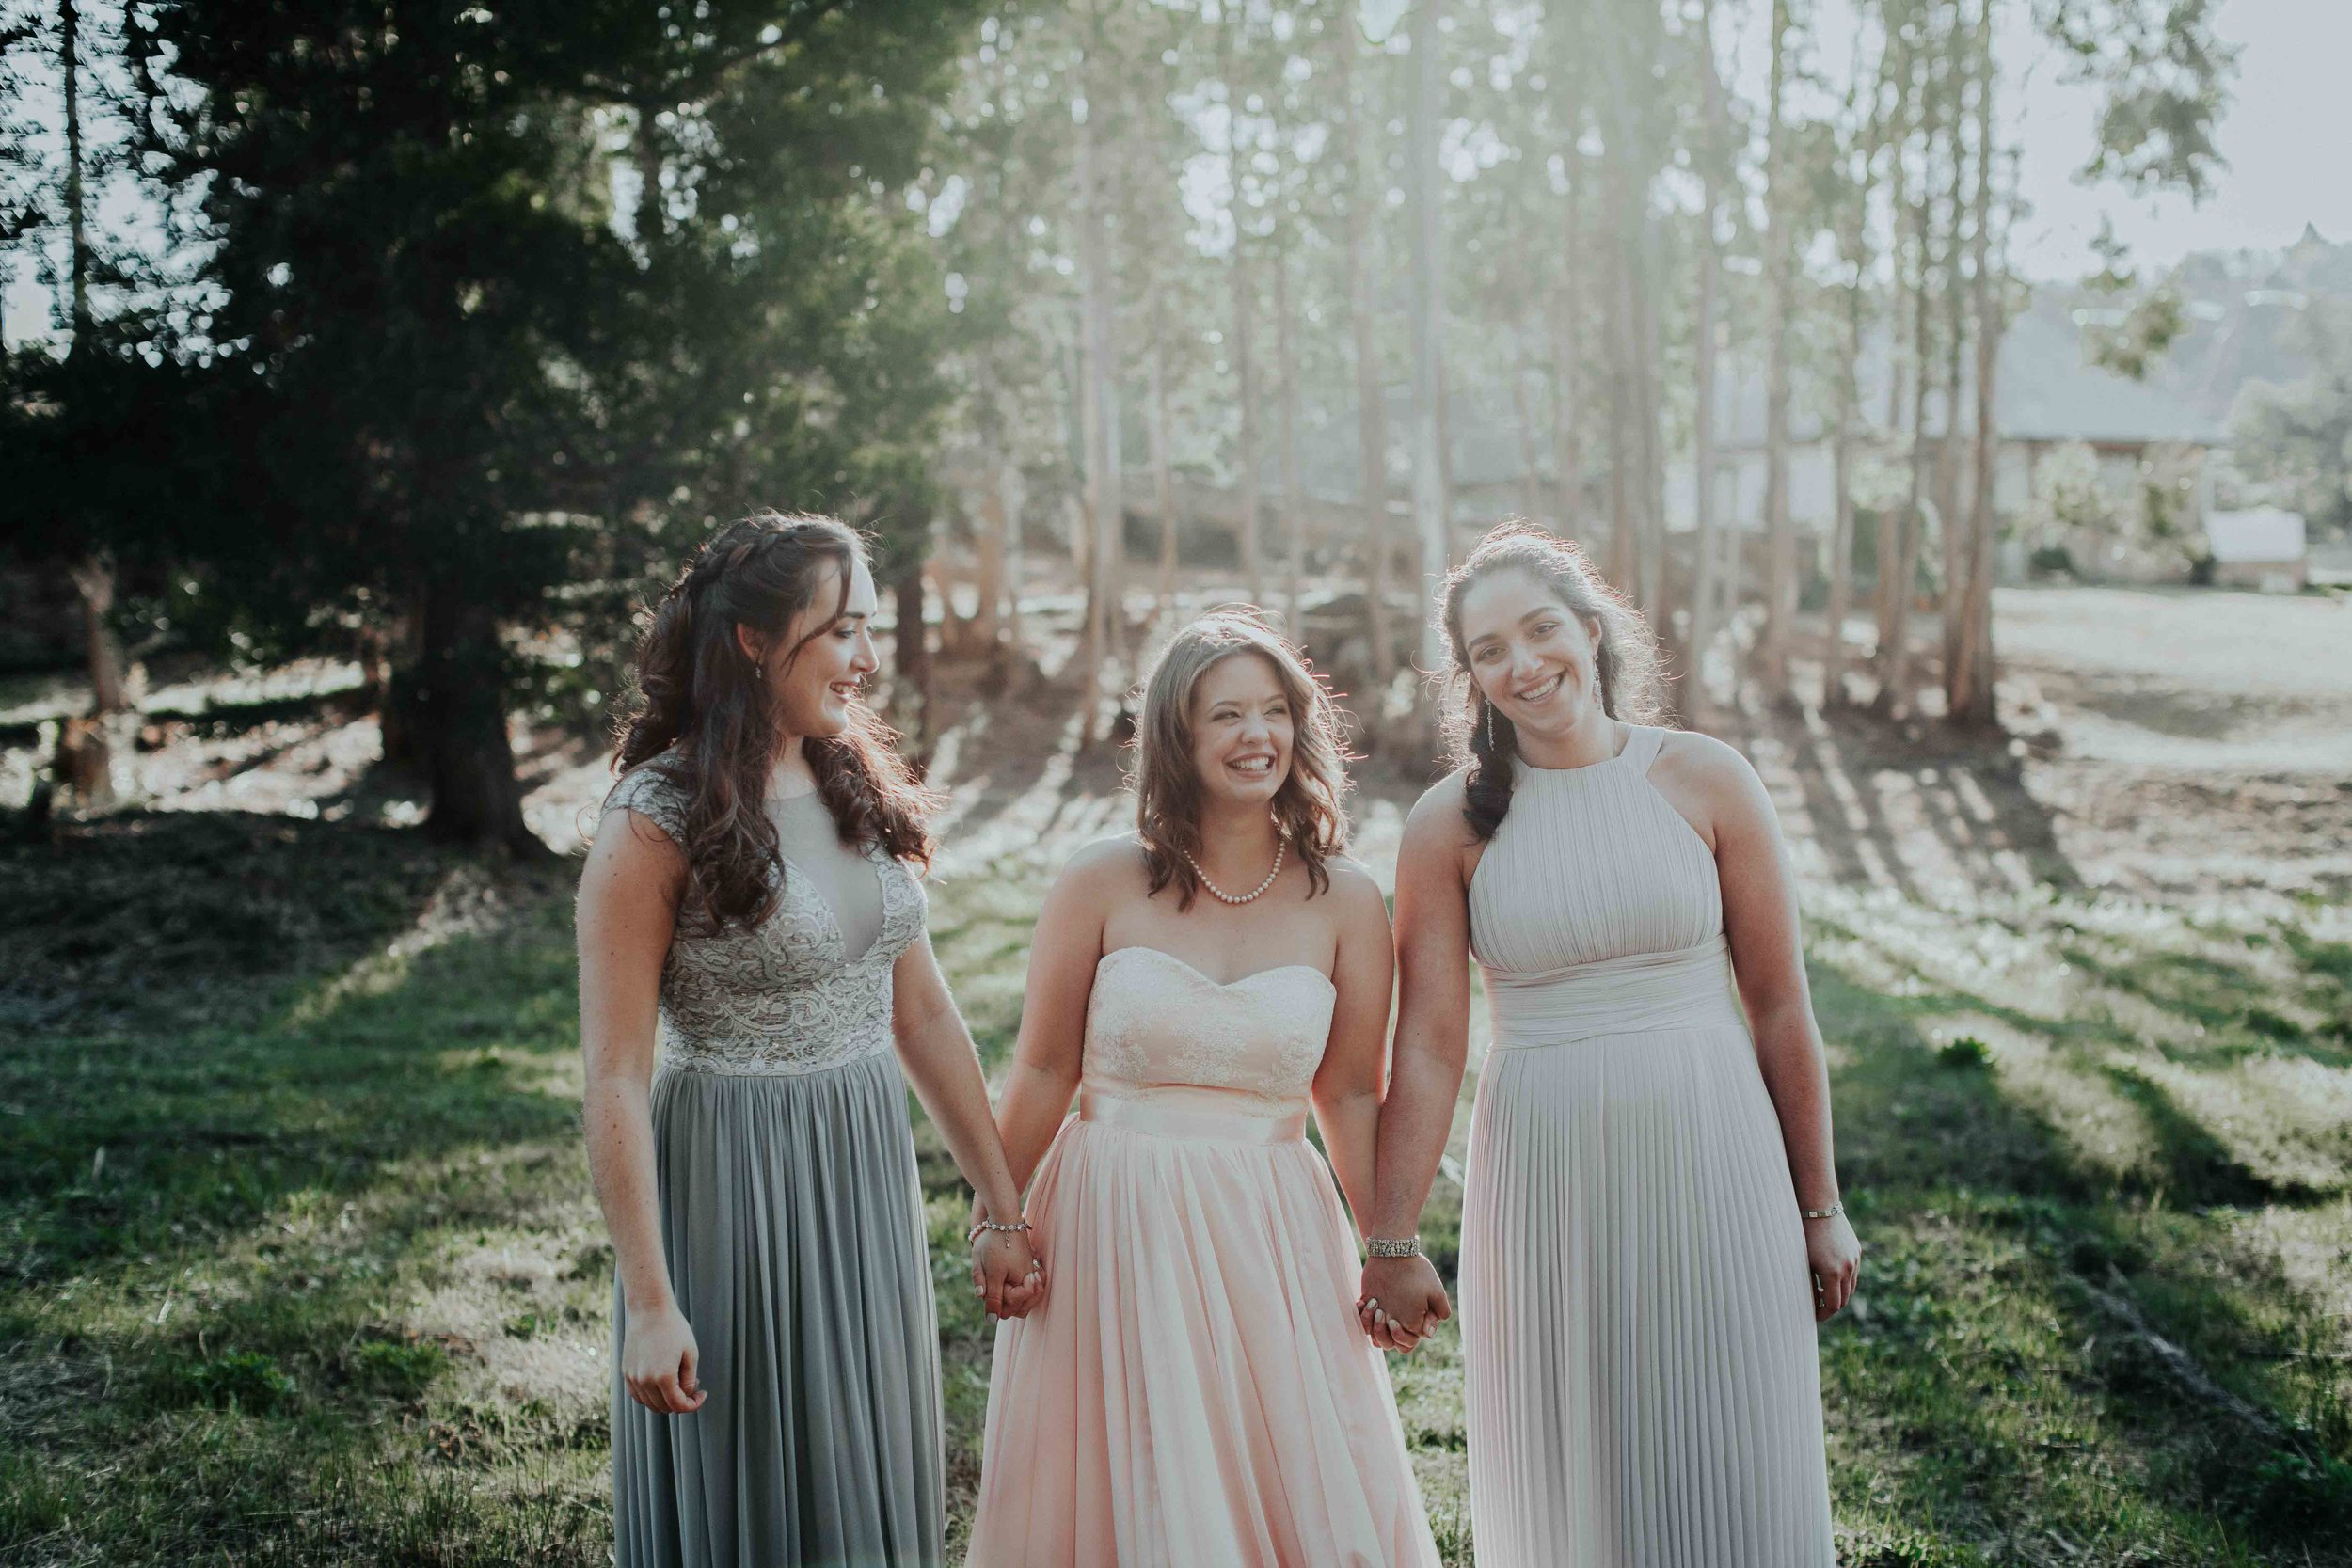 Kristi Smith Photography - Wedding Photography - Darryl & Meg 18.jpg